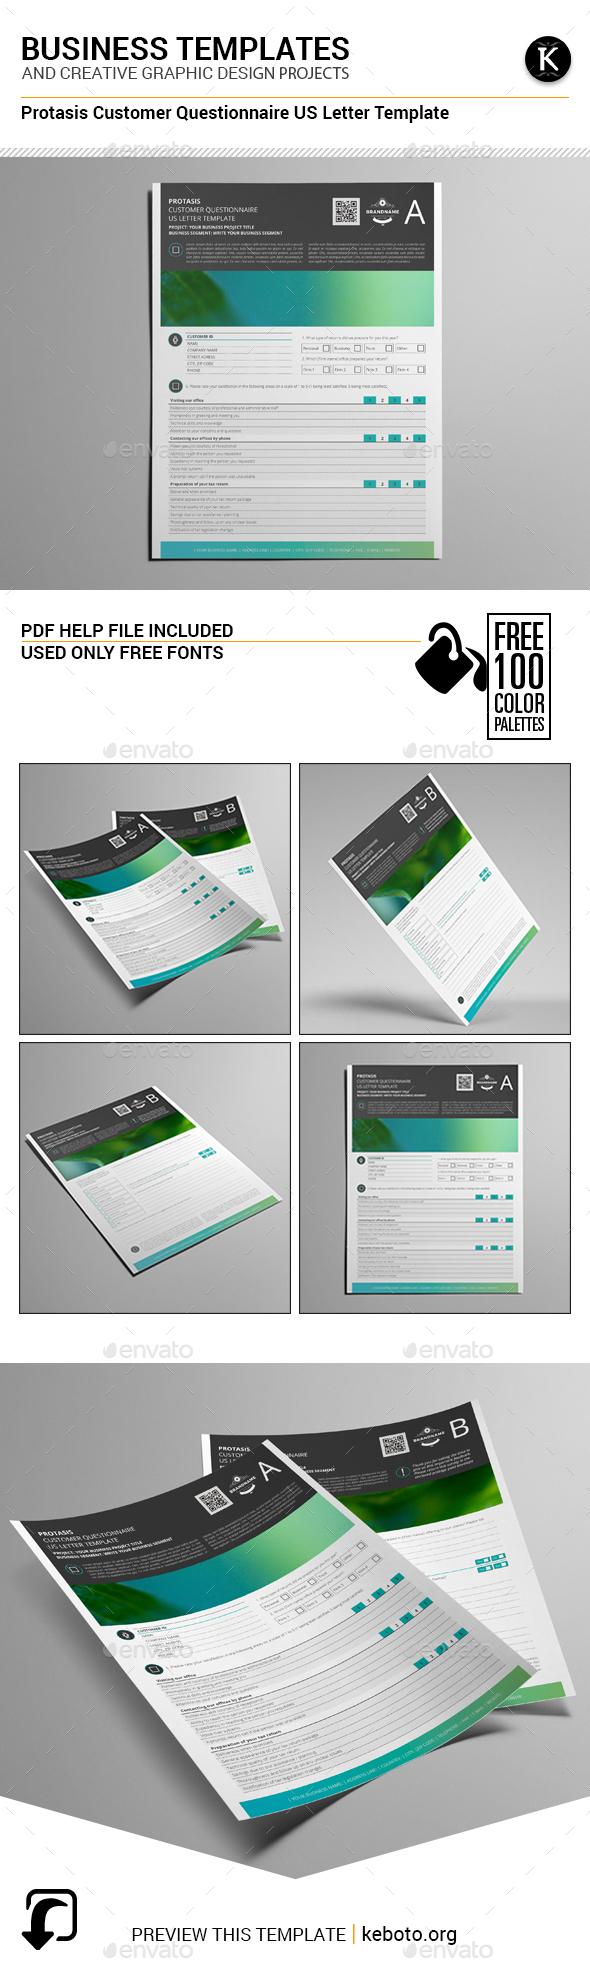 Protasis Customer Questionnaire US Letter Template - Miscellaneous Print Templates